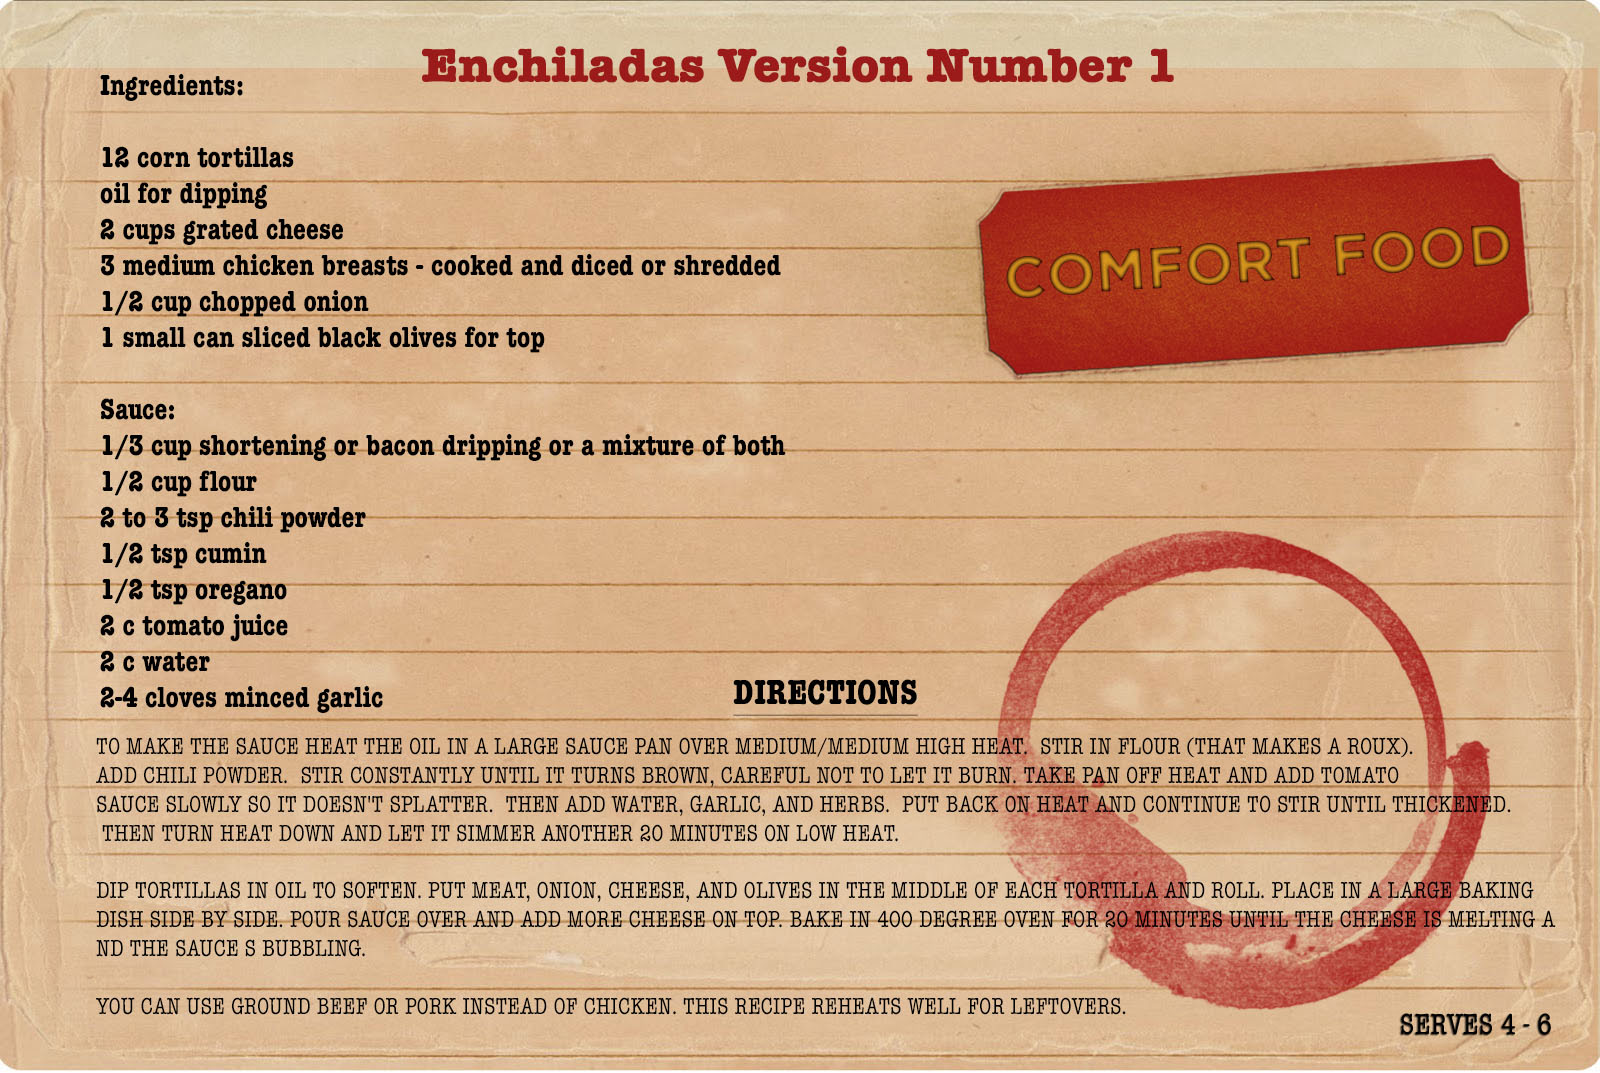 Comfort Food Recipe Enchiladas Version 1.jpg